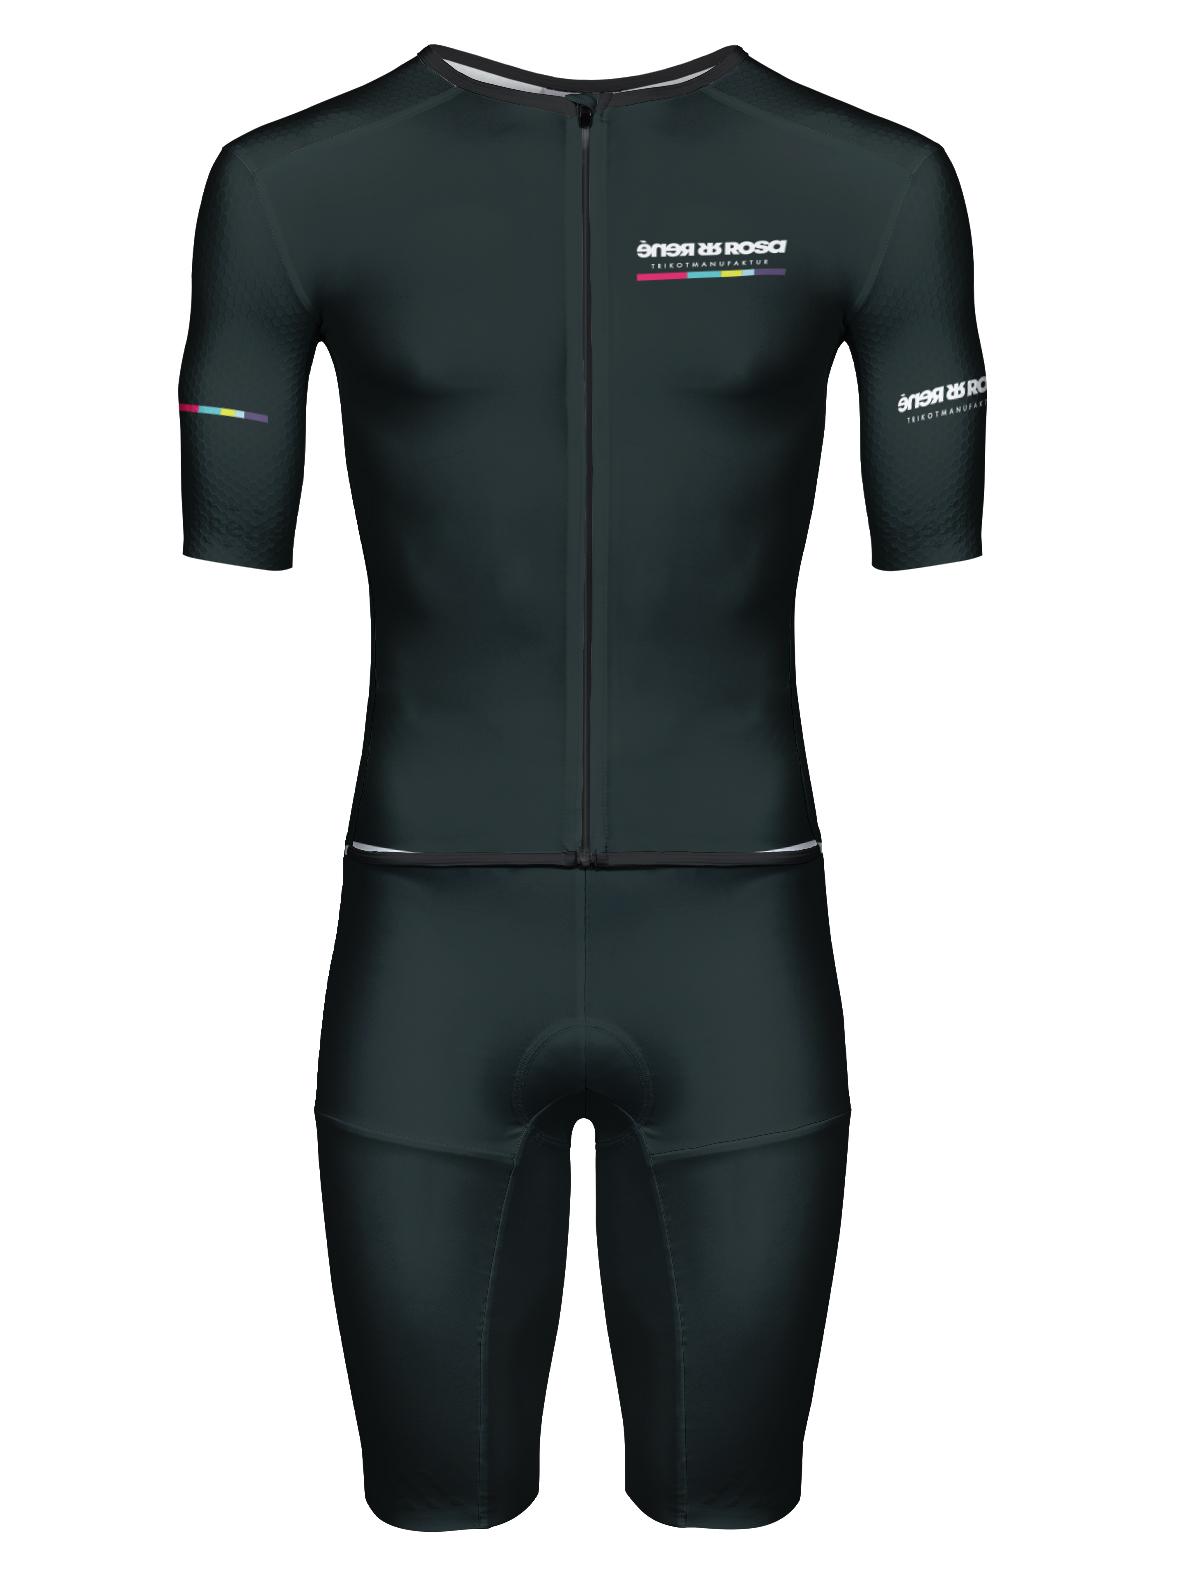 Aero Triathlon Einteiler  RRT2777M Herren Longversion / RR-Stripes Black